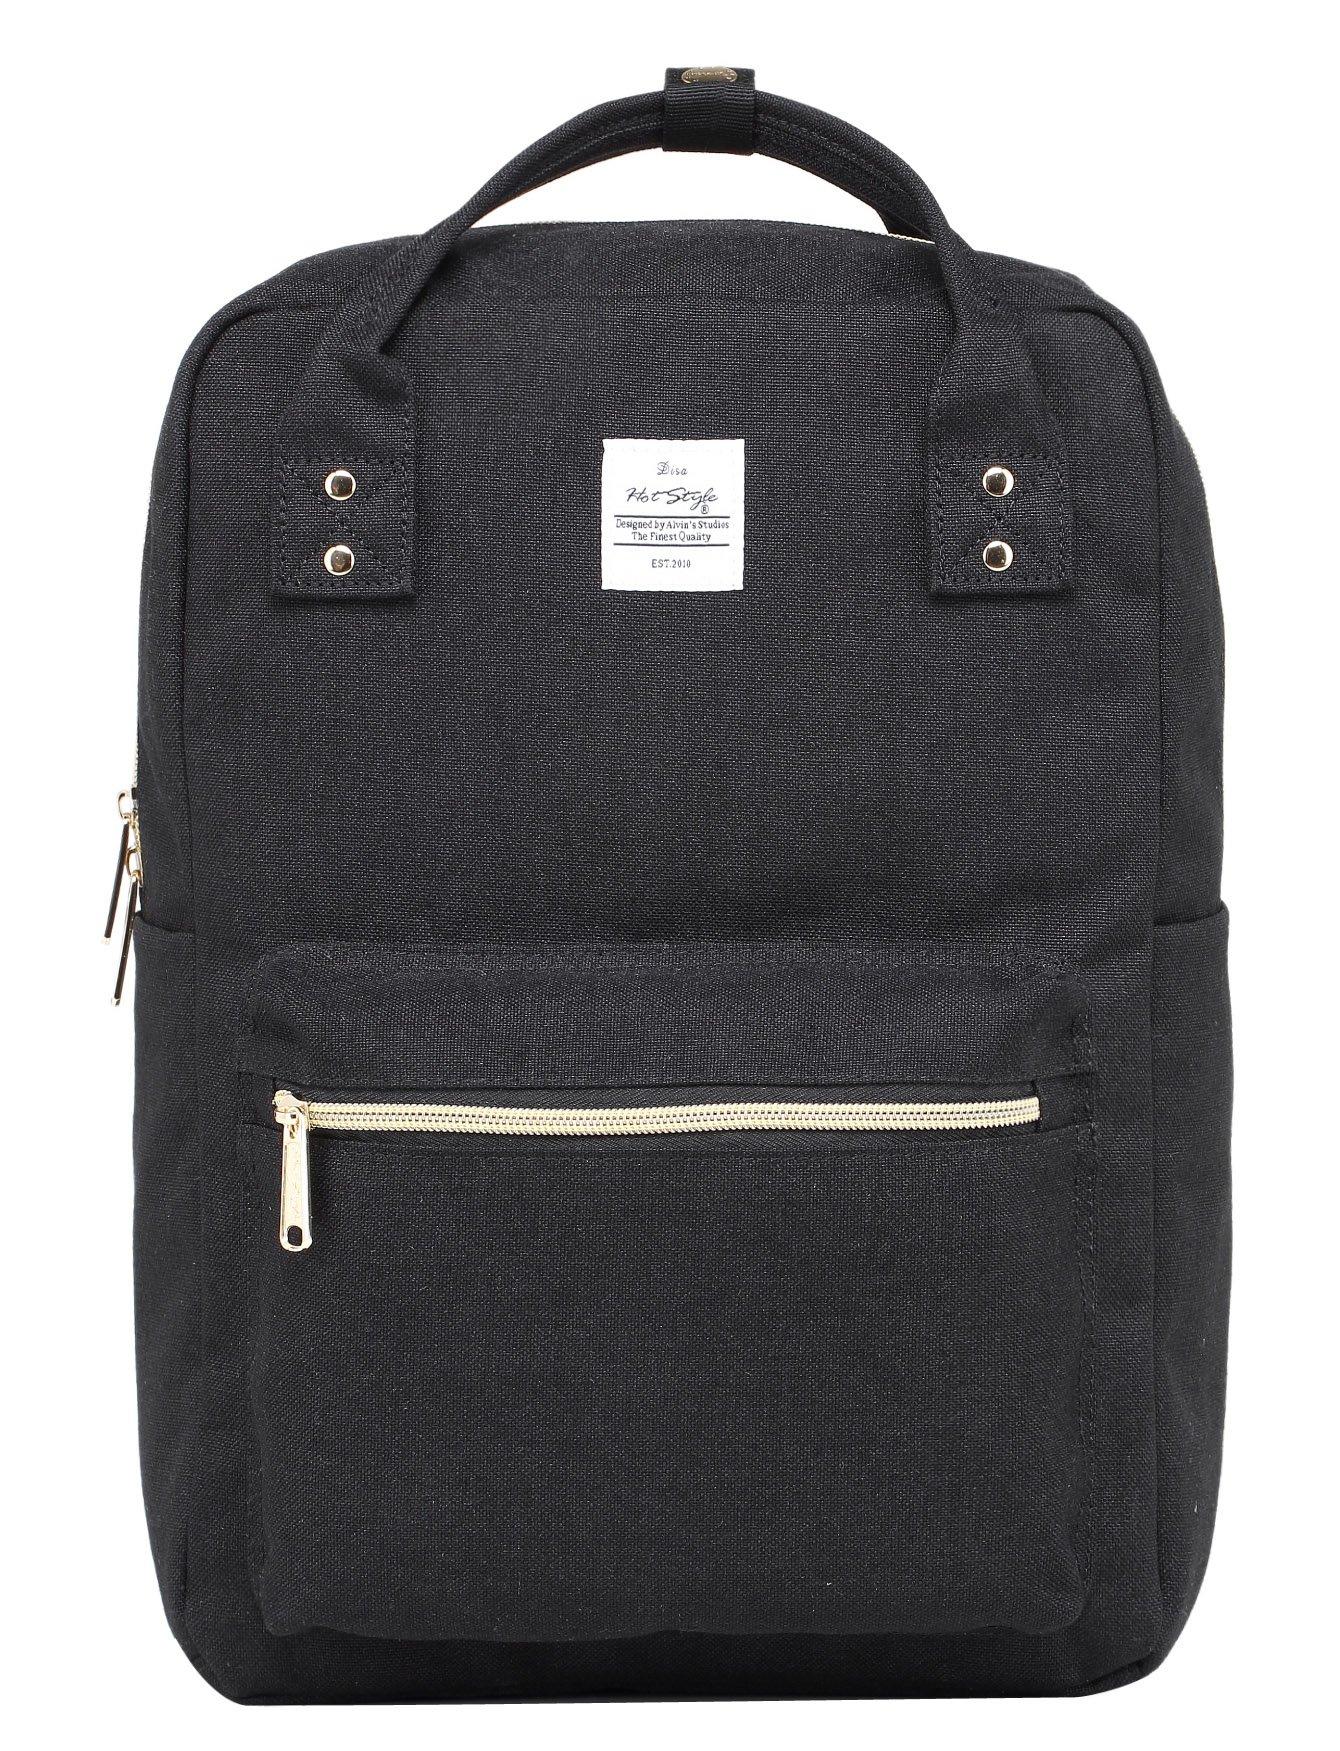 DISA Backpack Purse   Fits 15-inch MacBook   14.3''x10''x5.5''   Black